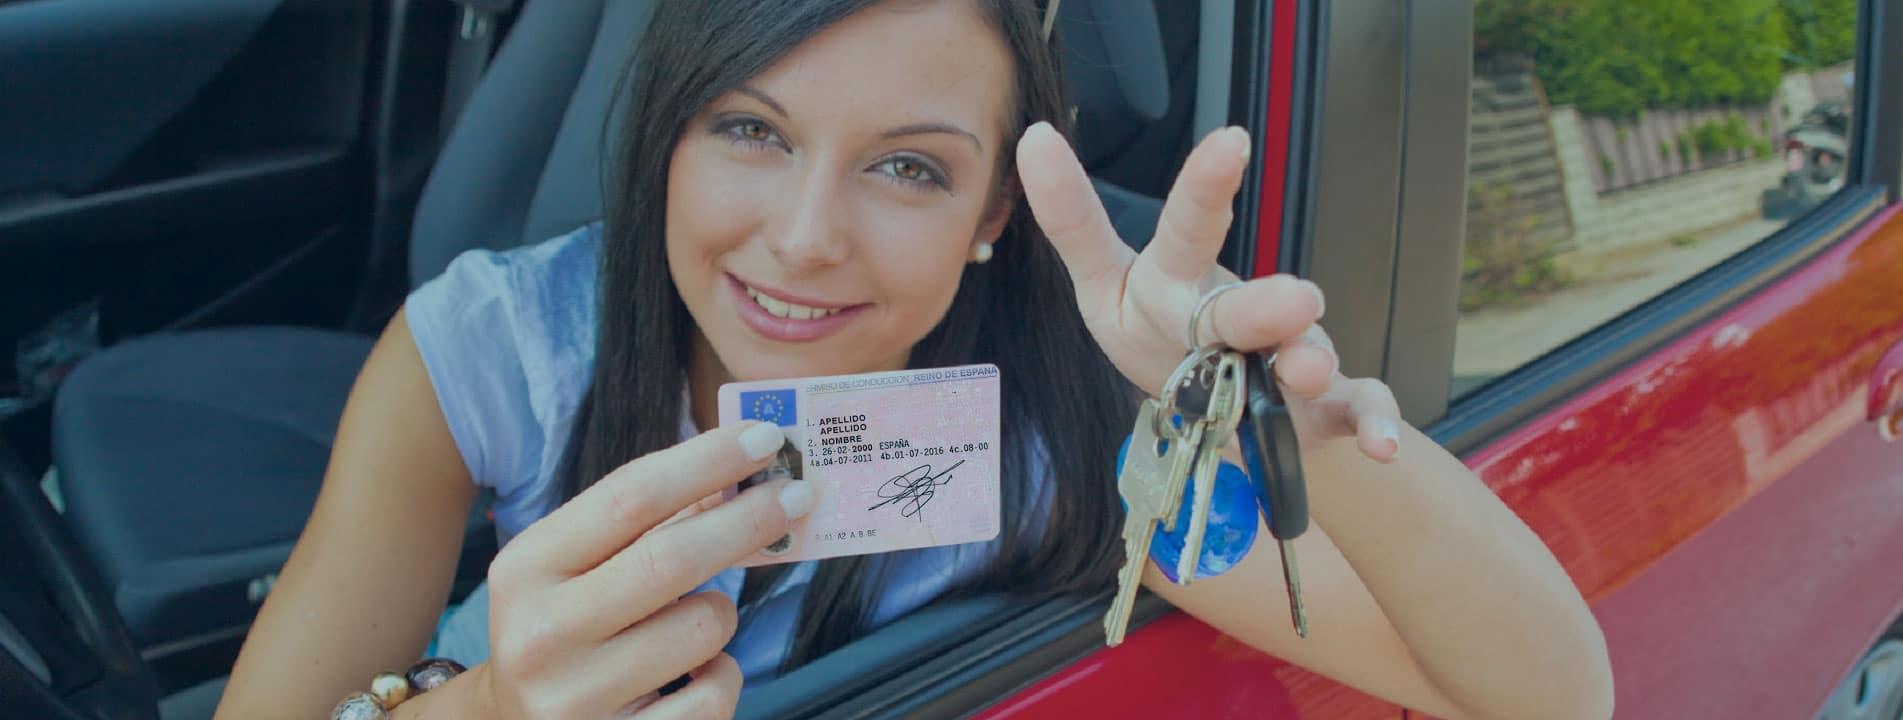 Duplicados-carnet-conducir-Certimedic